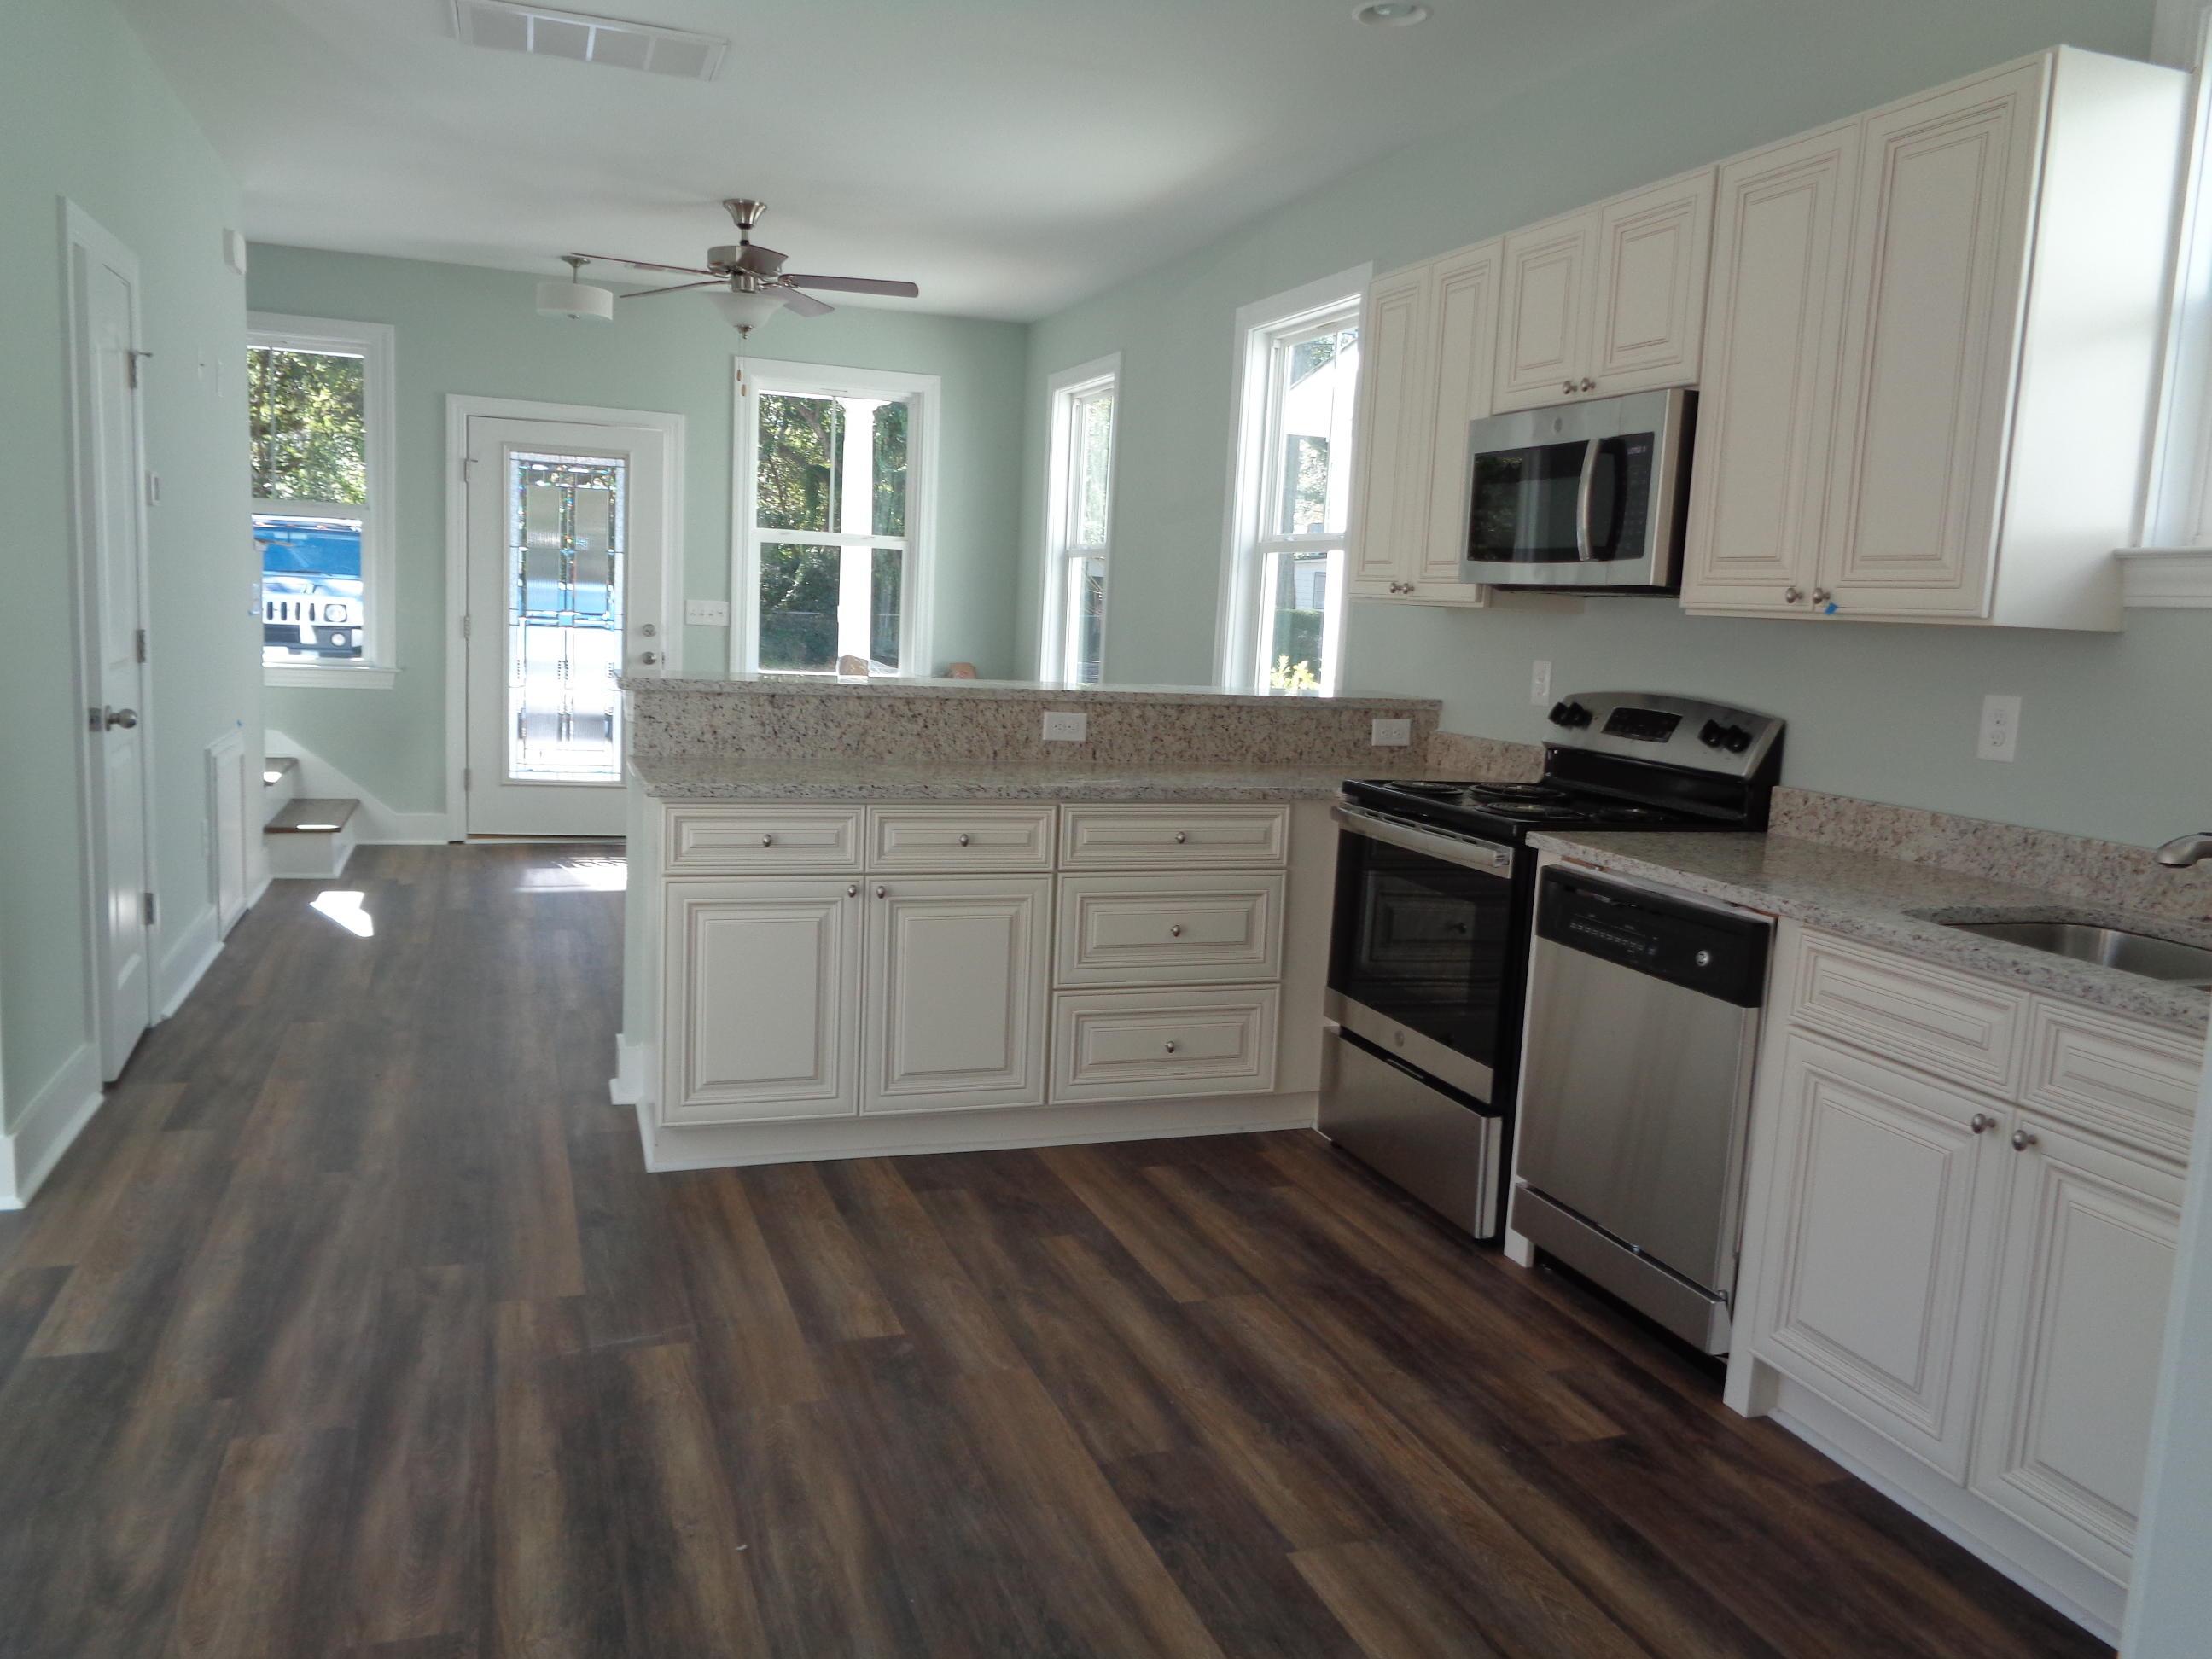 Pinecrest Gardens Homes For Sale - 1626 Wappoo, Charleston, SC - 24